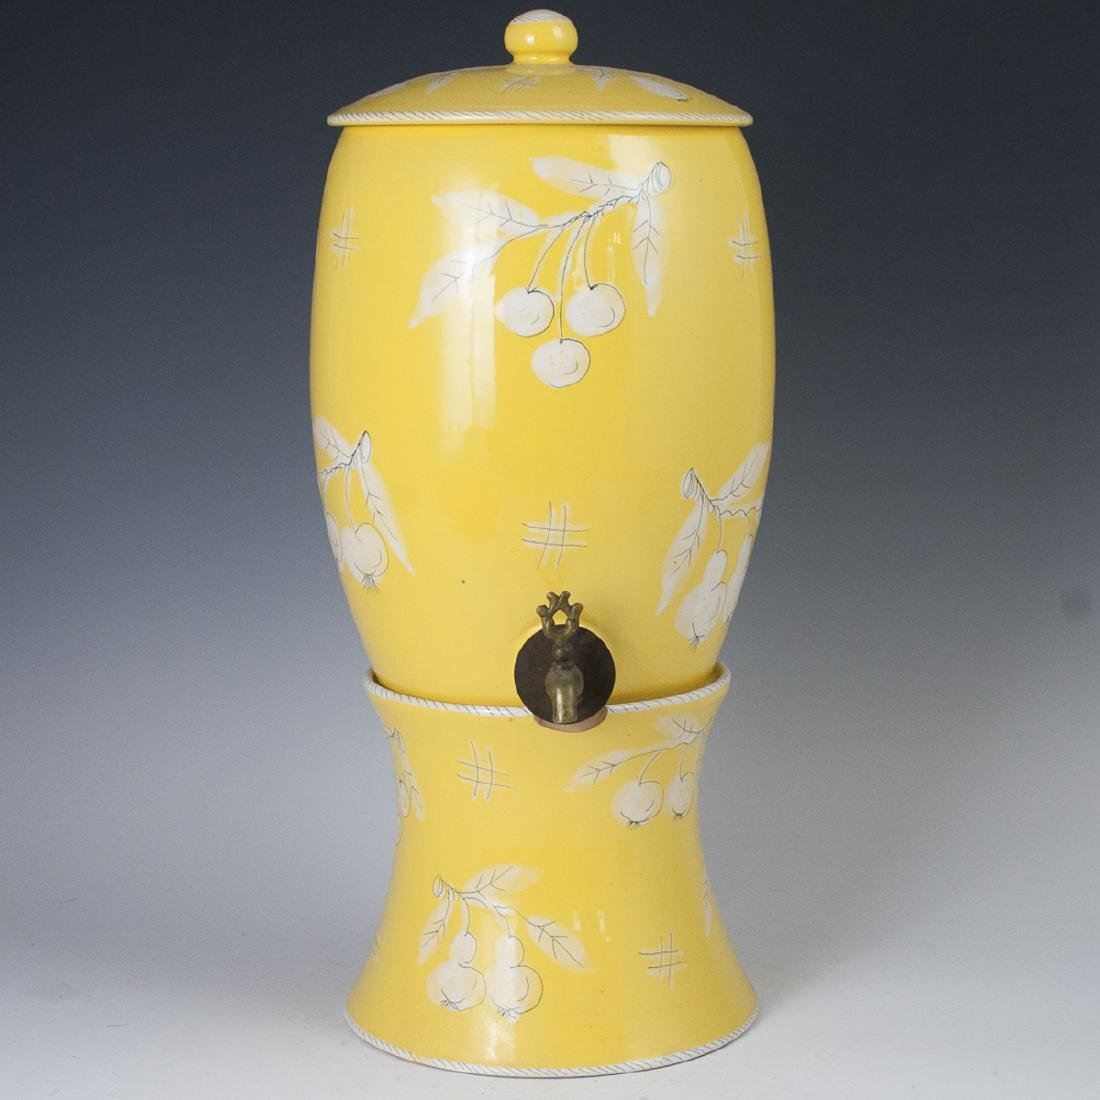 Vintage Italian Majolica Pottery Punch Dispenser